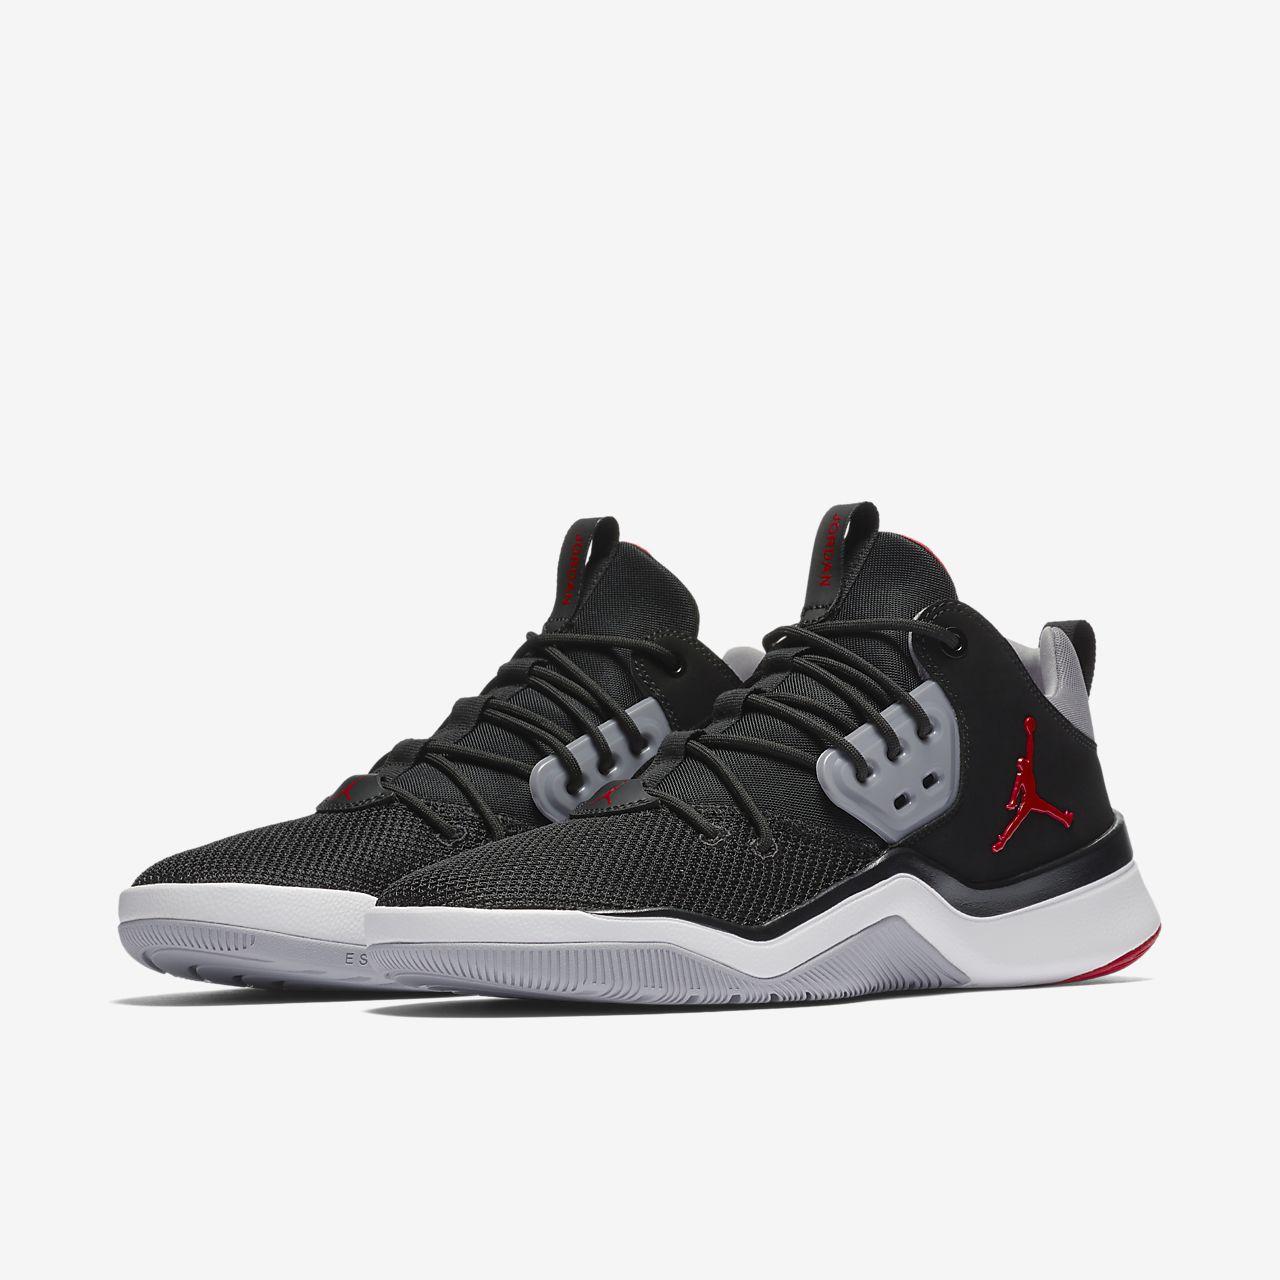 Sneaker NIKE JORDAN Uomo Jordan dna Comprar Moda Barata 82U47hFb